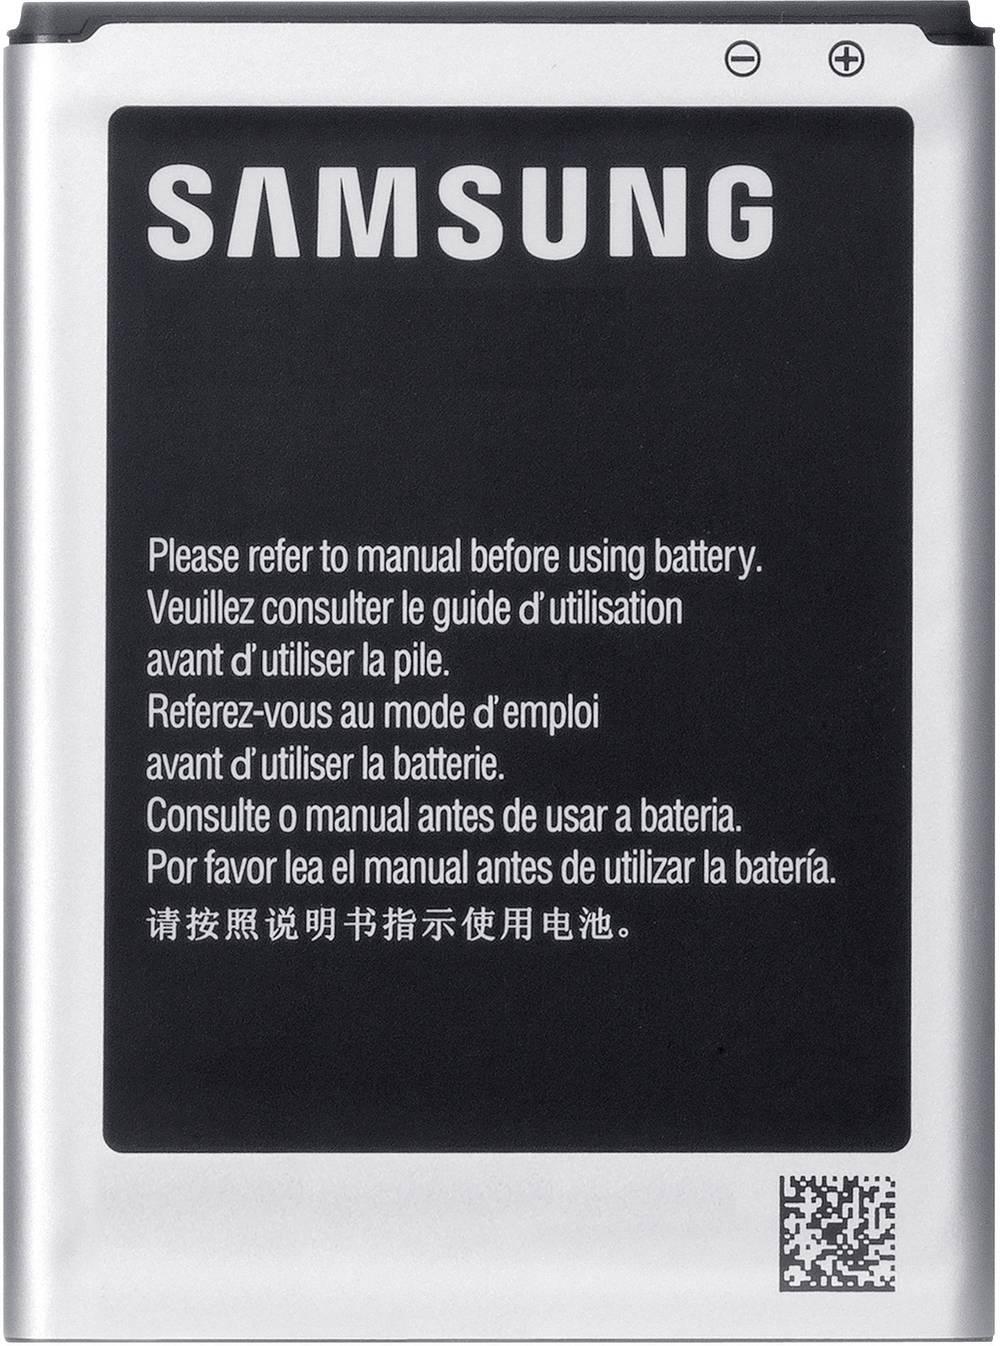 Samsung Li-Ion baterija za mobilni telefon 1900 mAh za Samsung Galaxy S4 Mini i9195 EB-B500BEBECWW